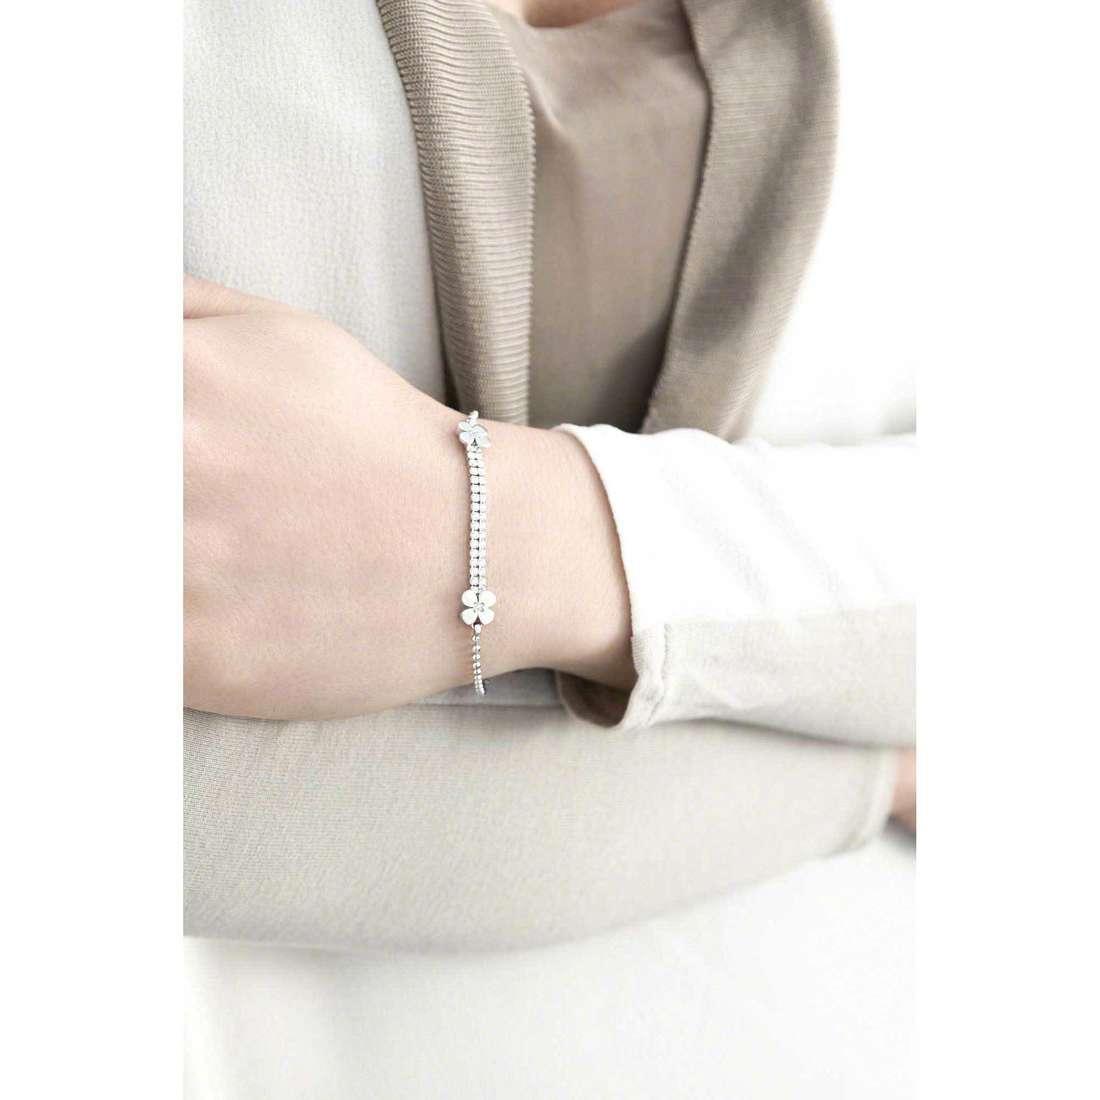 Jack&co bracelets Dream femme JCB0718 indosso